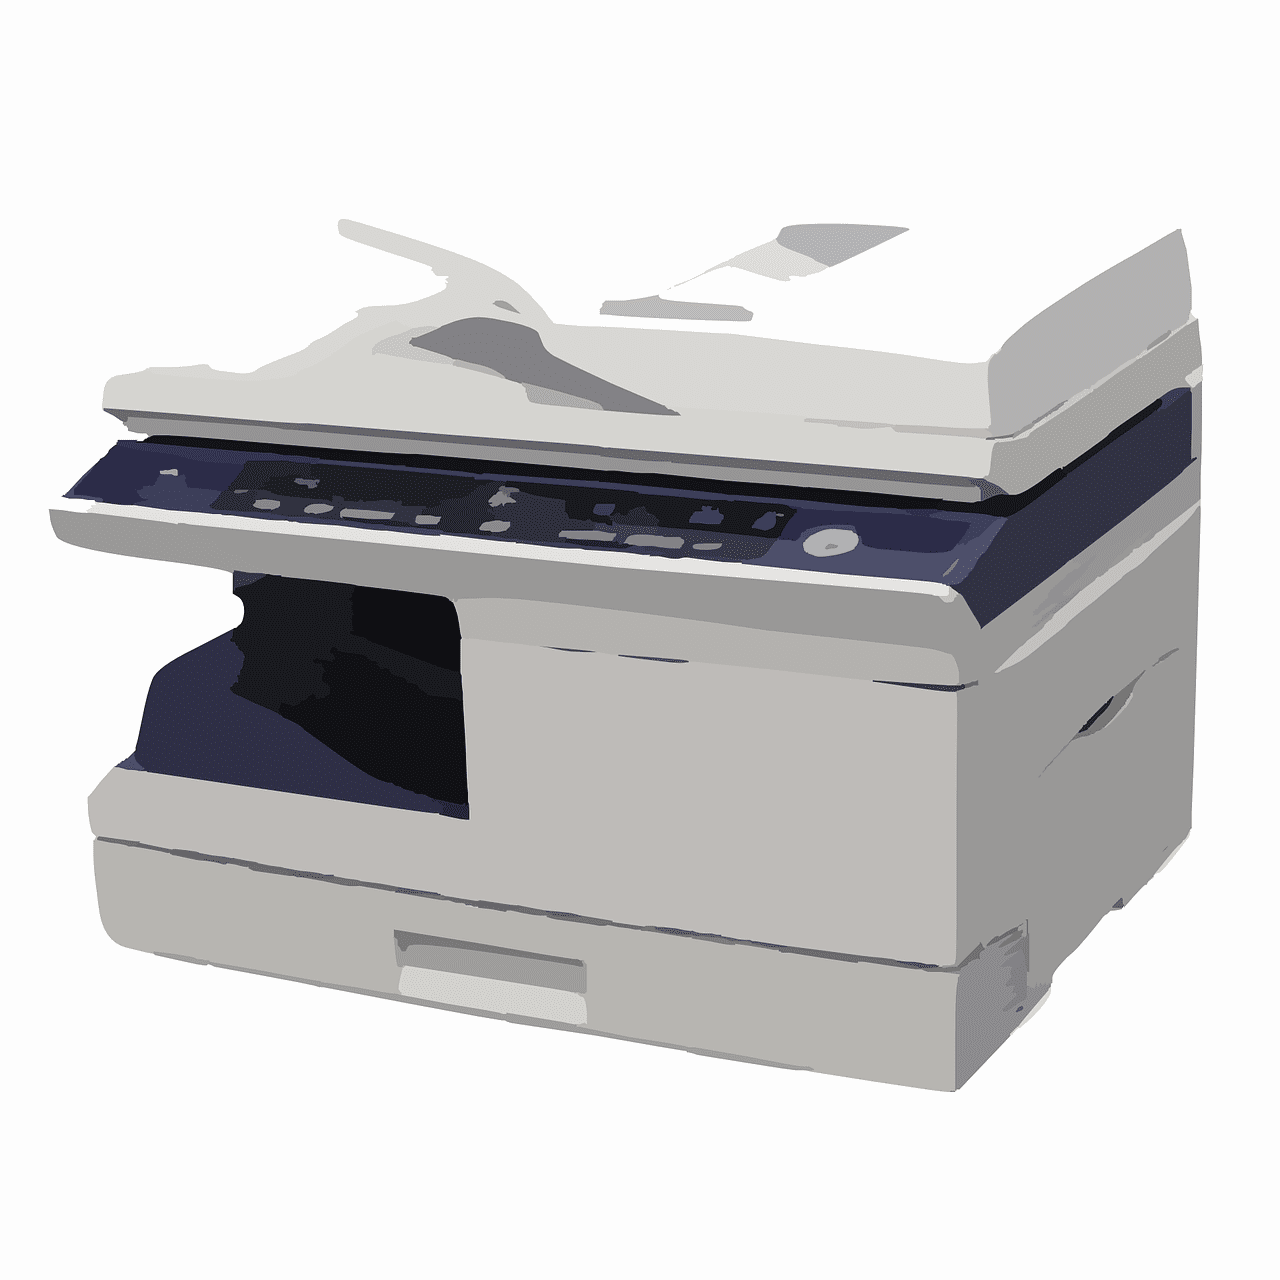 sebuah mesin fotocopy dibeli dengan harga